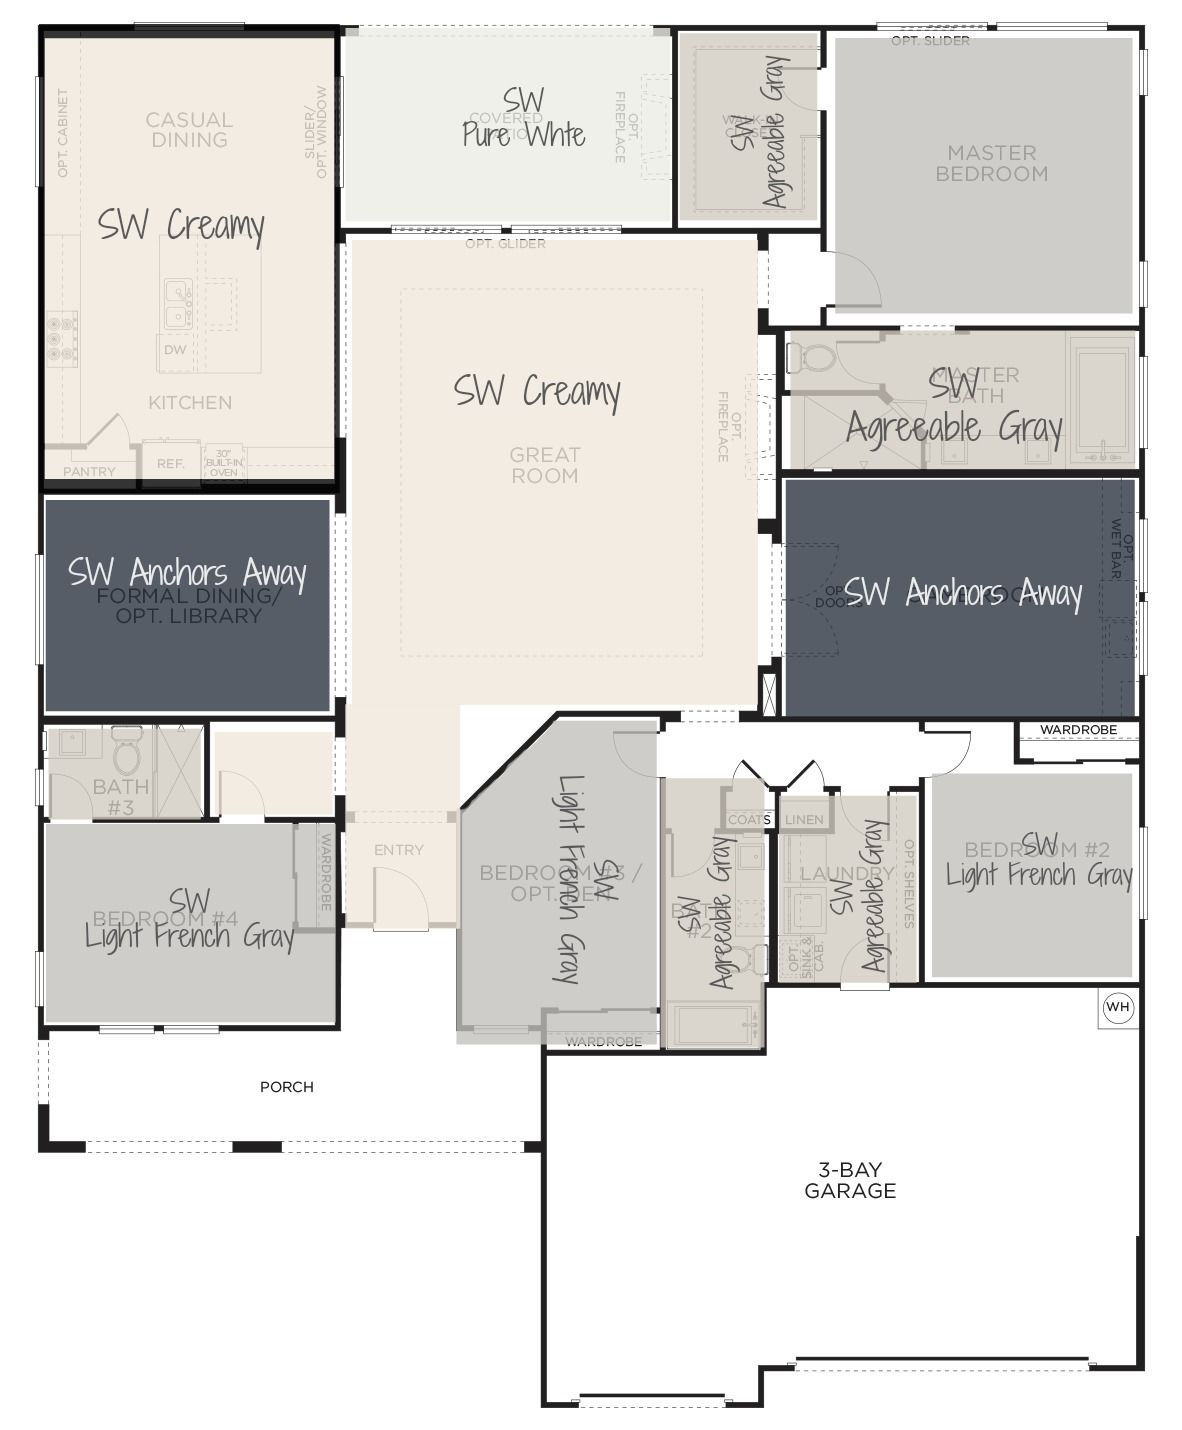 whole house color scheme house color schemes interior on house paint color combinations interior id=13178